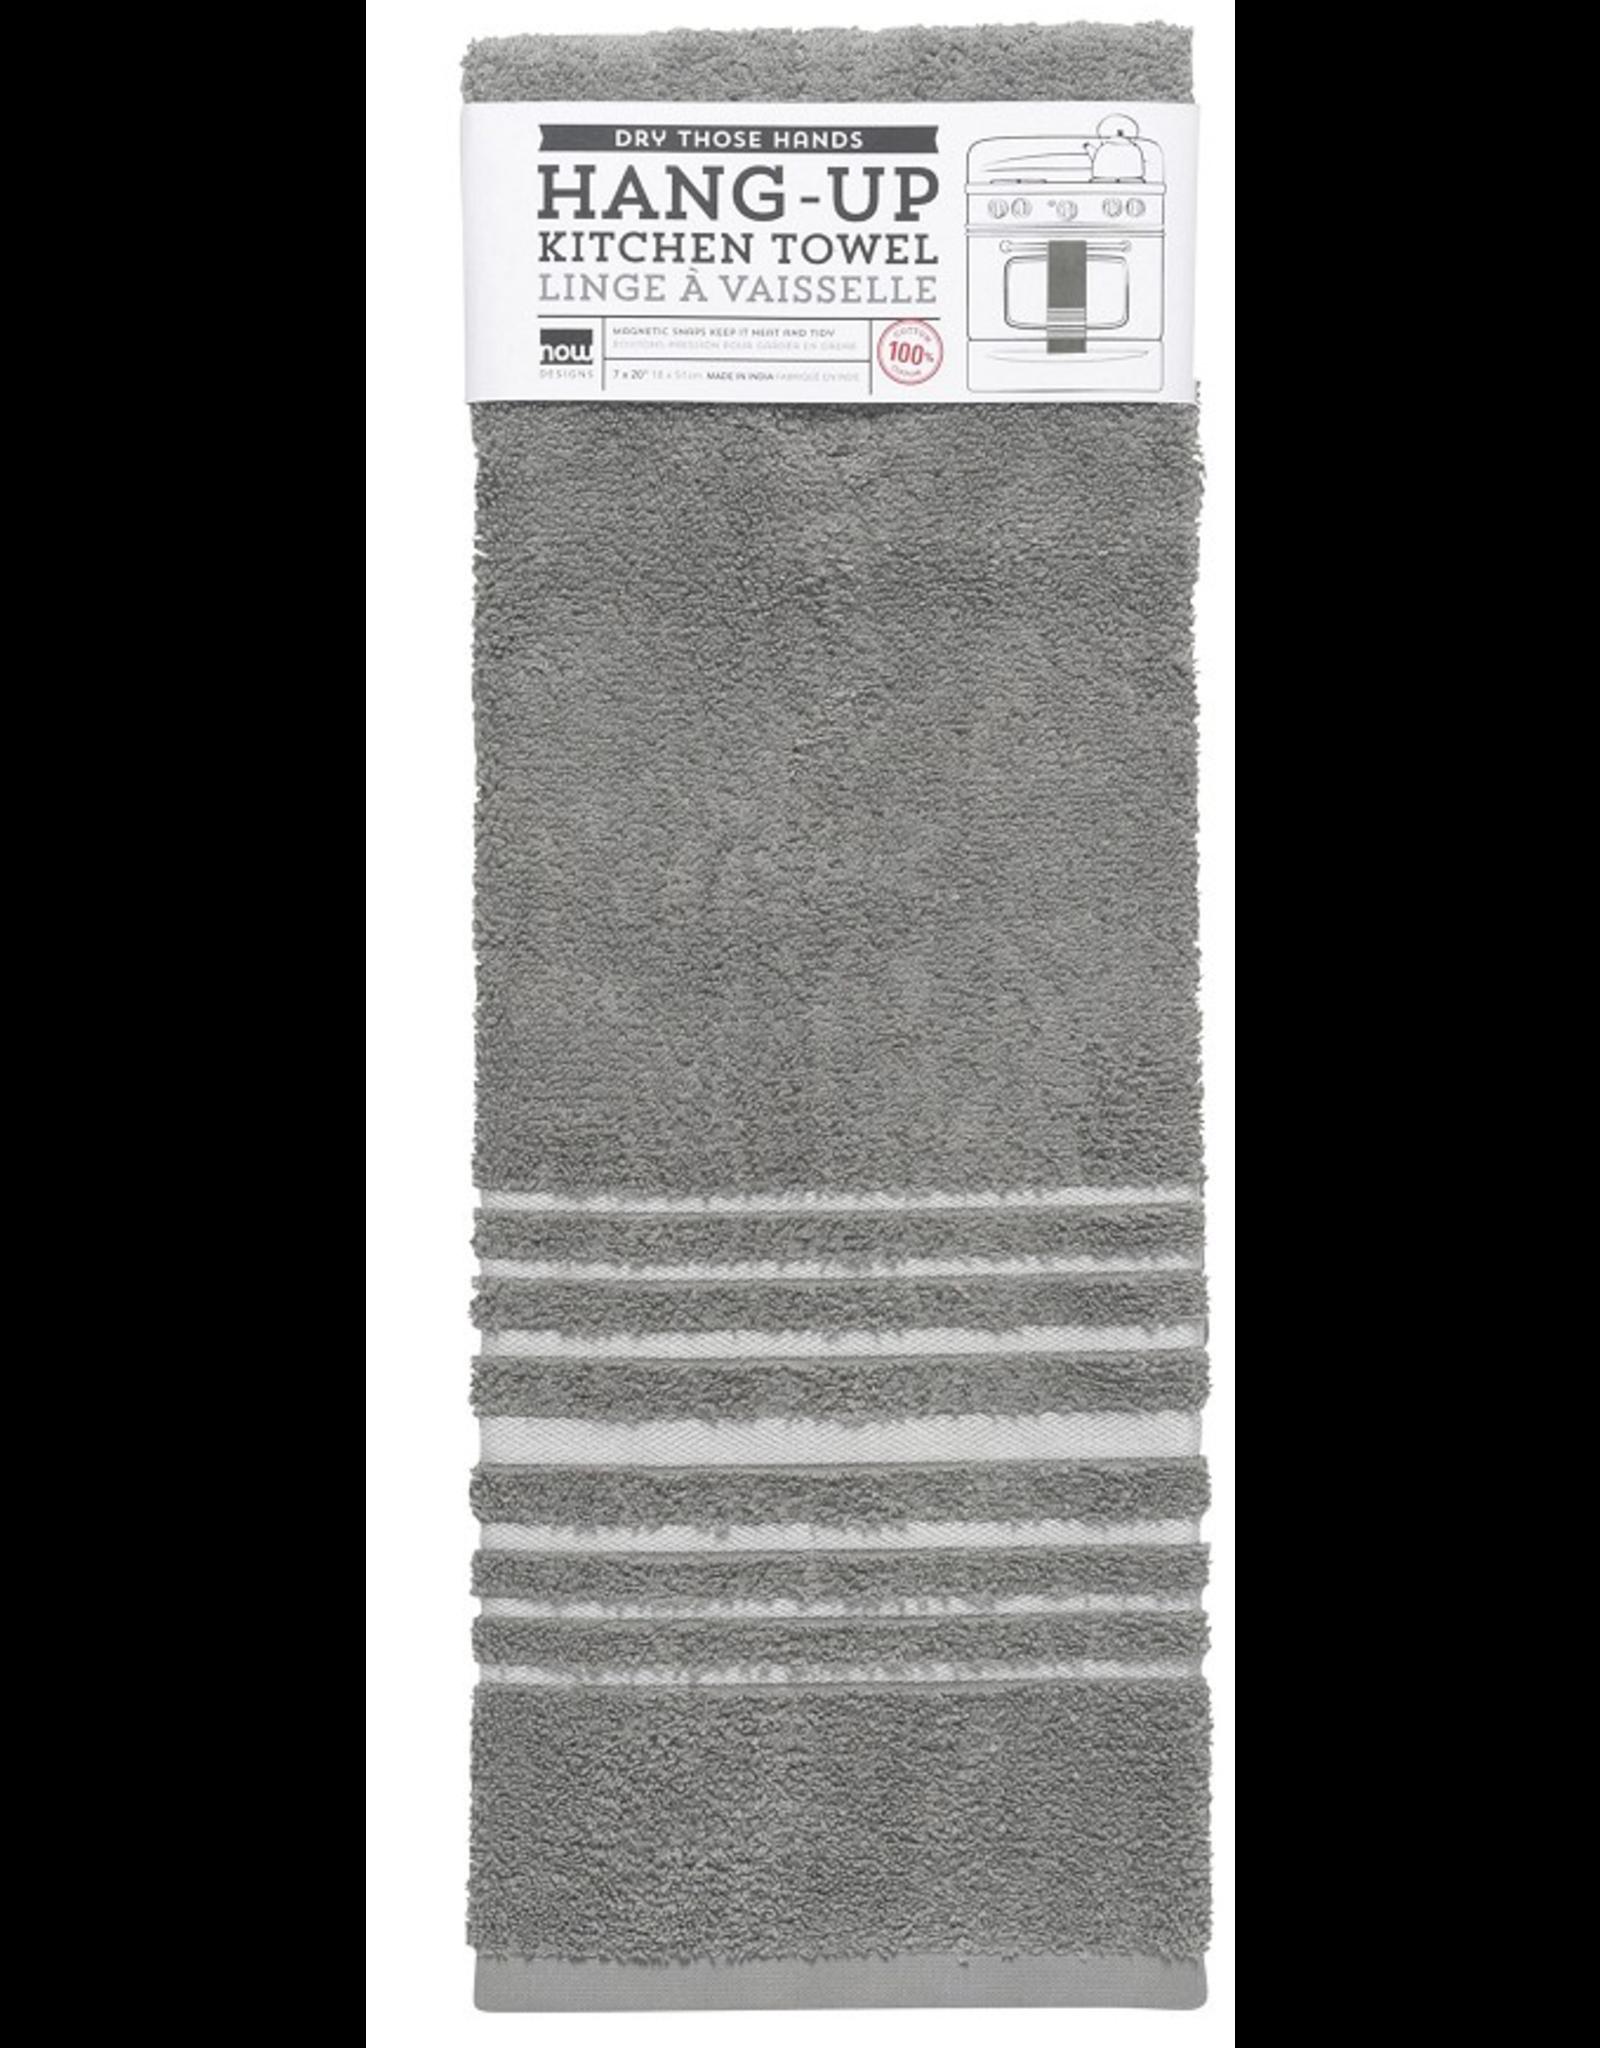 Hang-Up Hand Towel